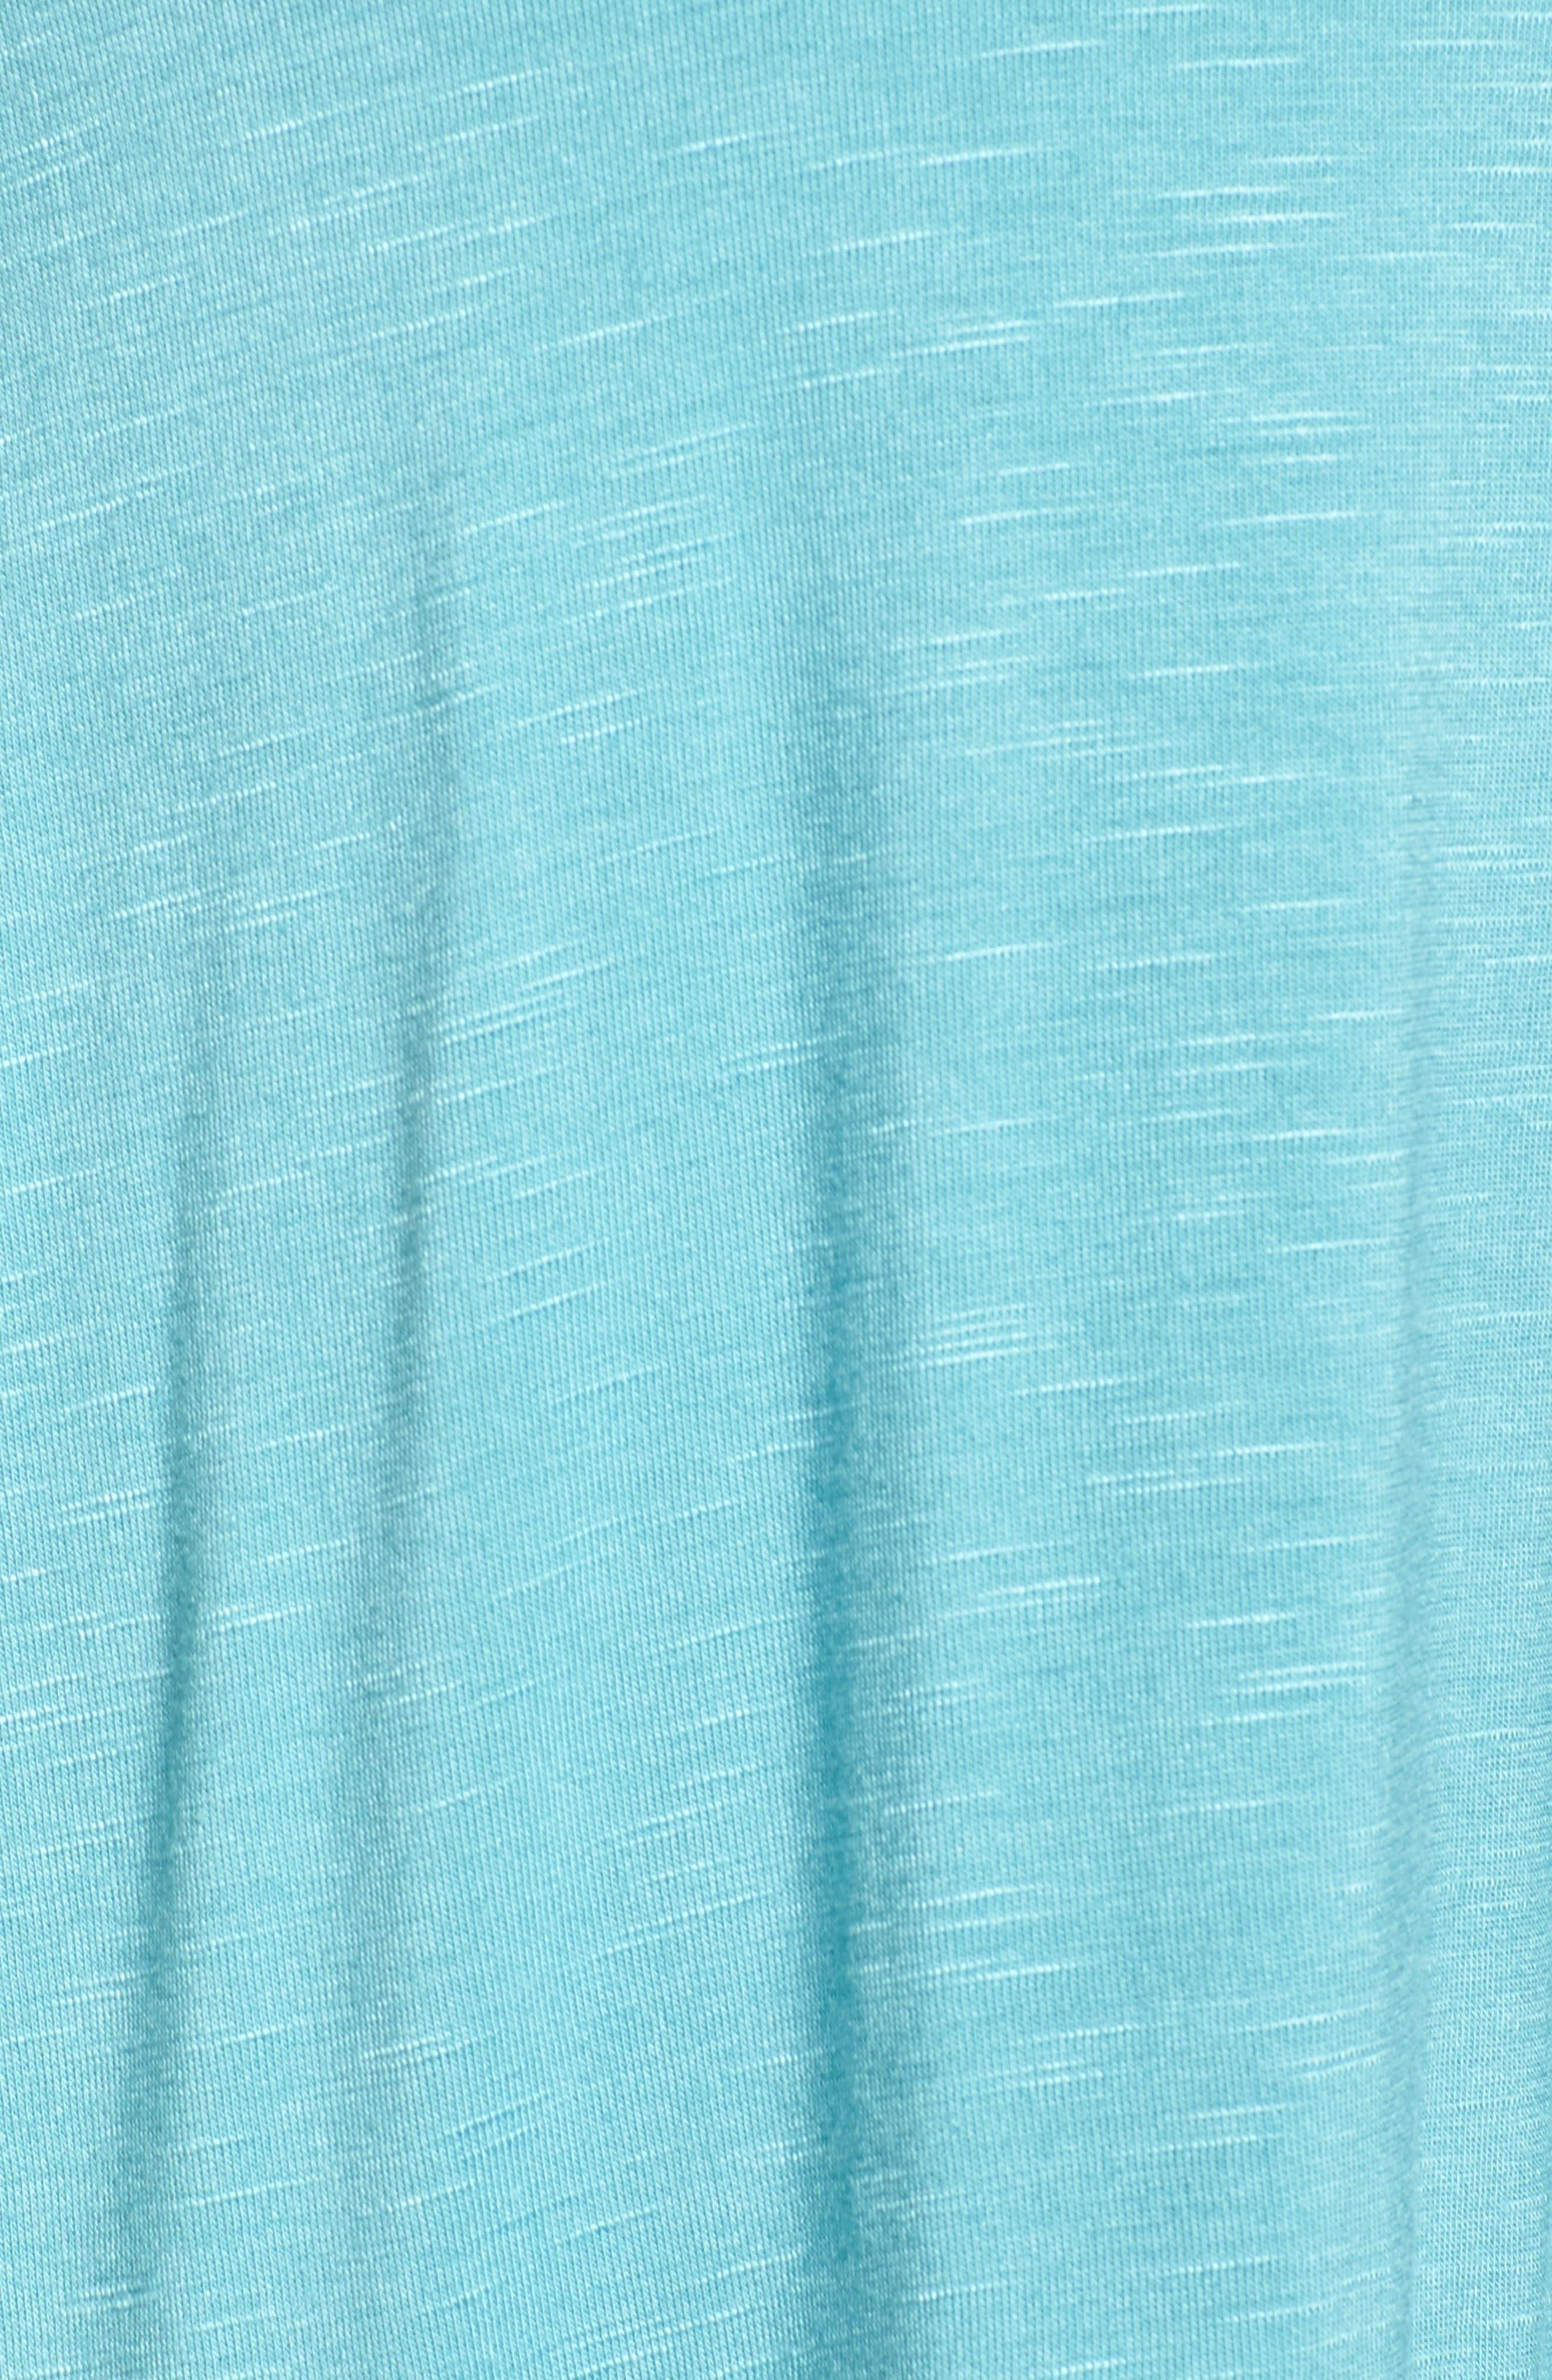 Ruffle Trim Tie Neck Top,                             Alternate thumbnail 5, color,                             Blue/ Green